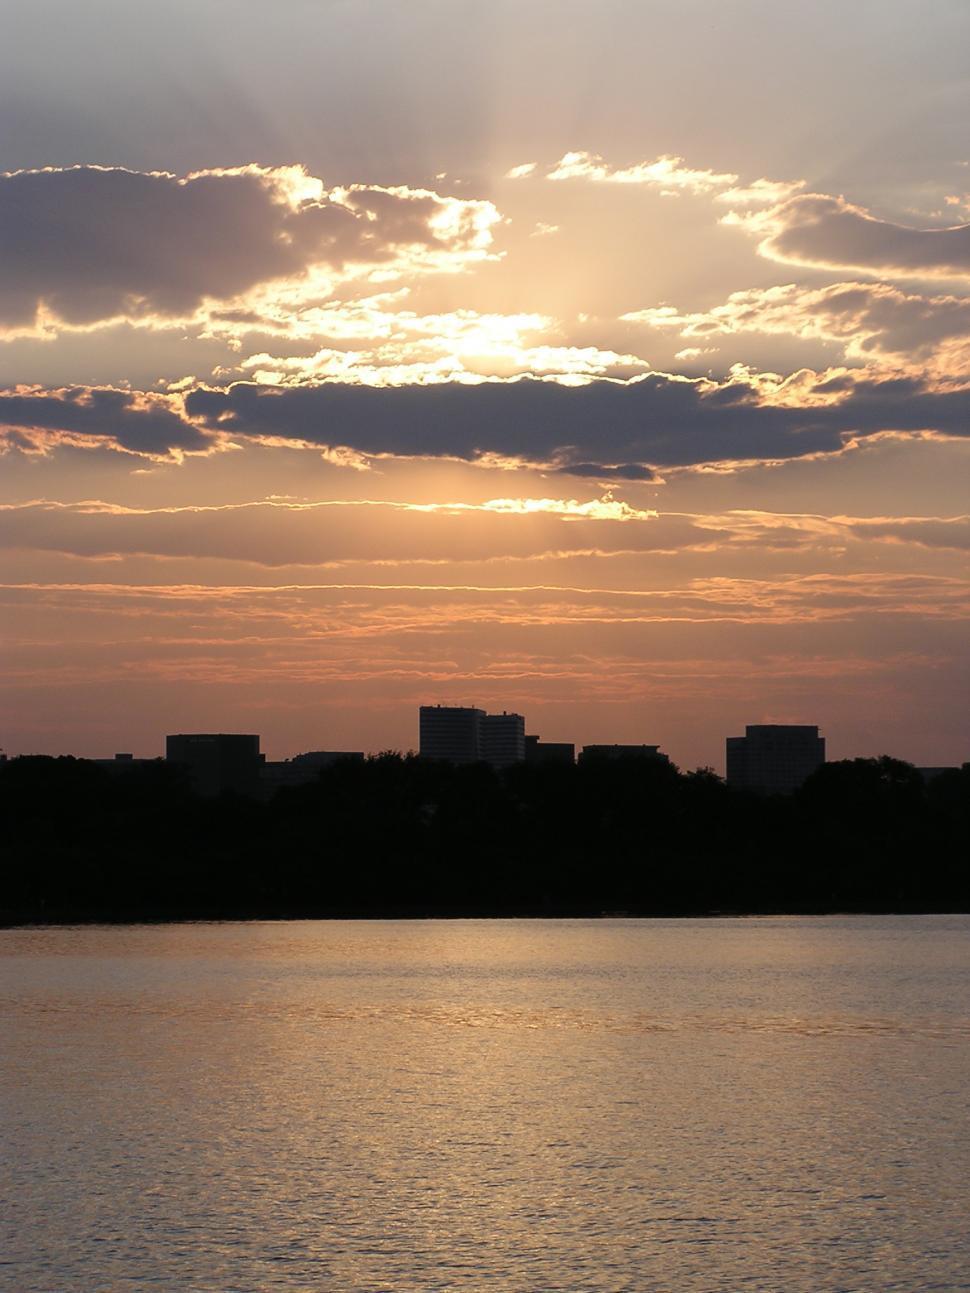 Download Free Stock Photo of Sunset in Washington DC